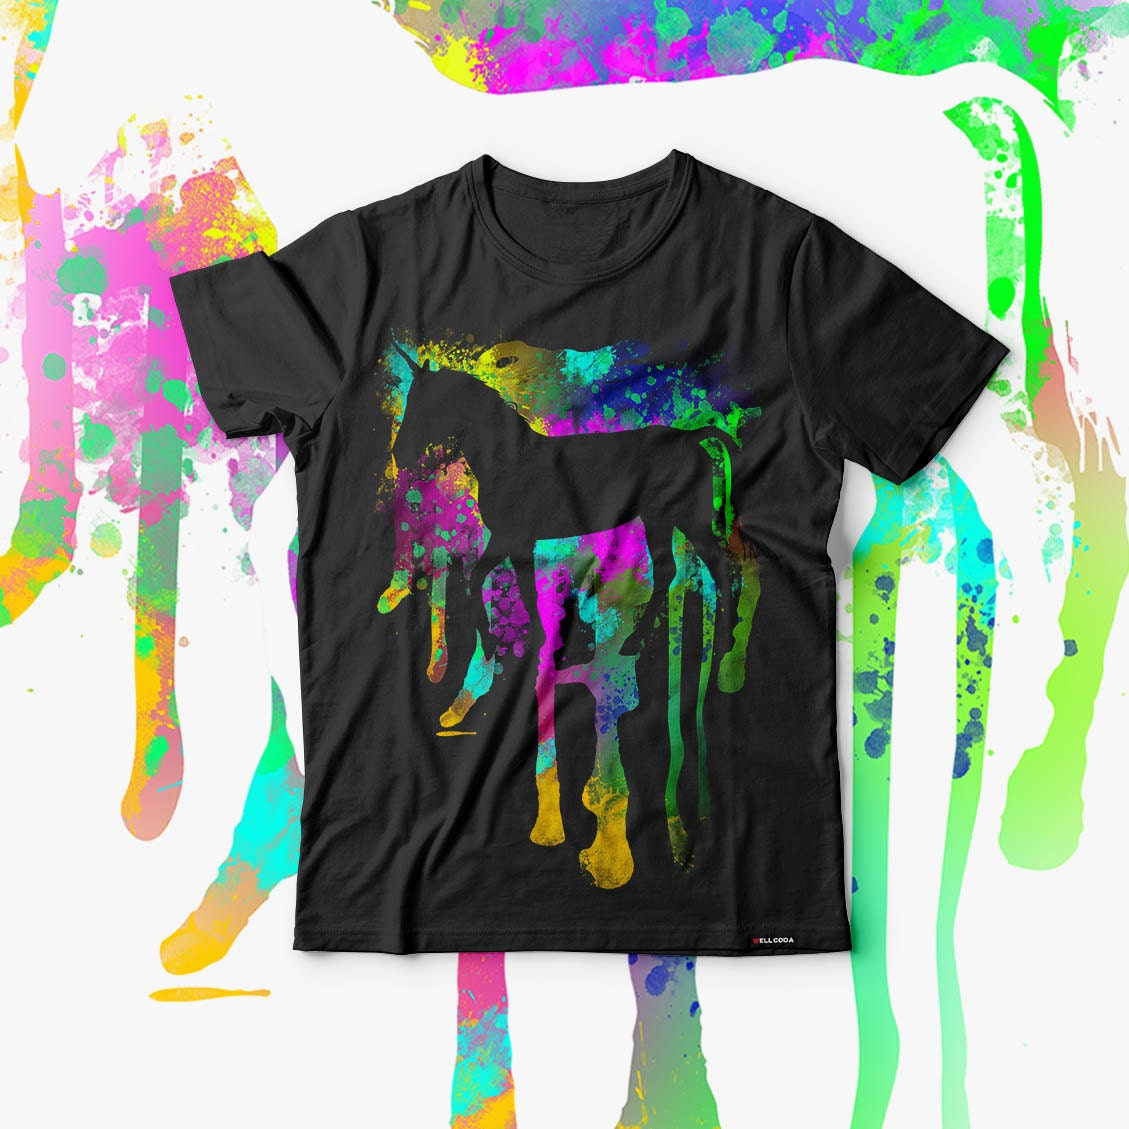 Unicorn Fantasy Art Myth Animal Men Black Tshirt S5XL NEW  Wellcoda